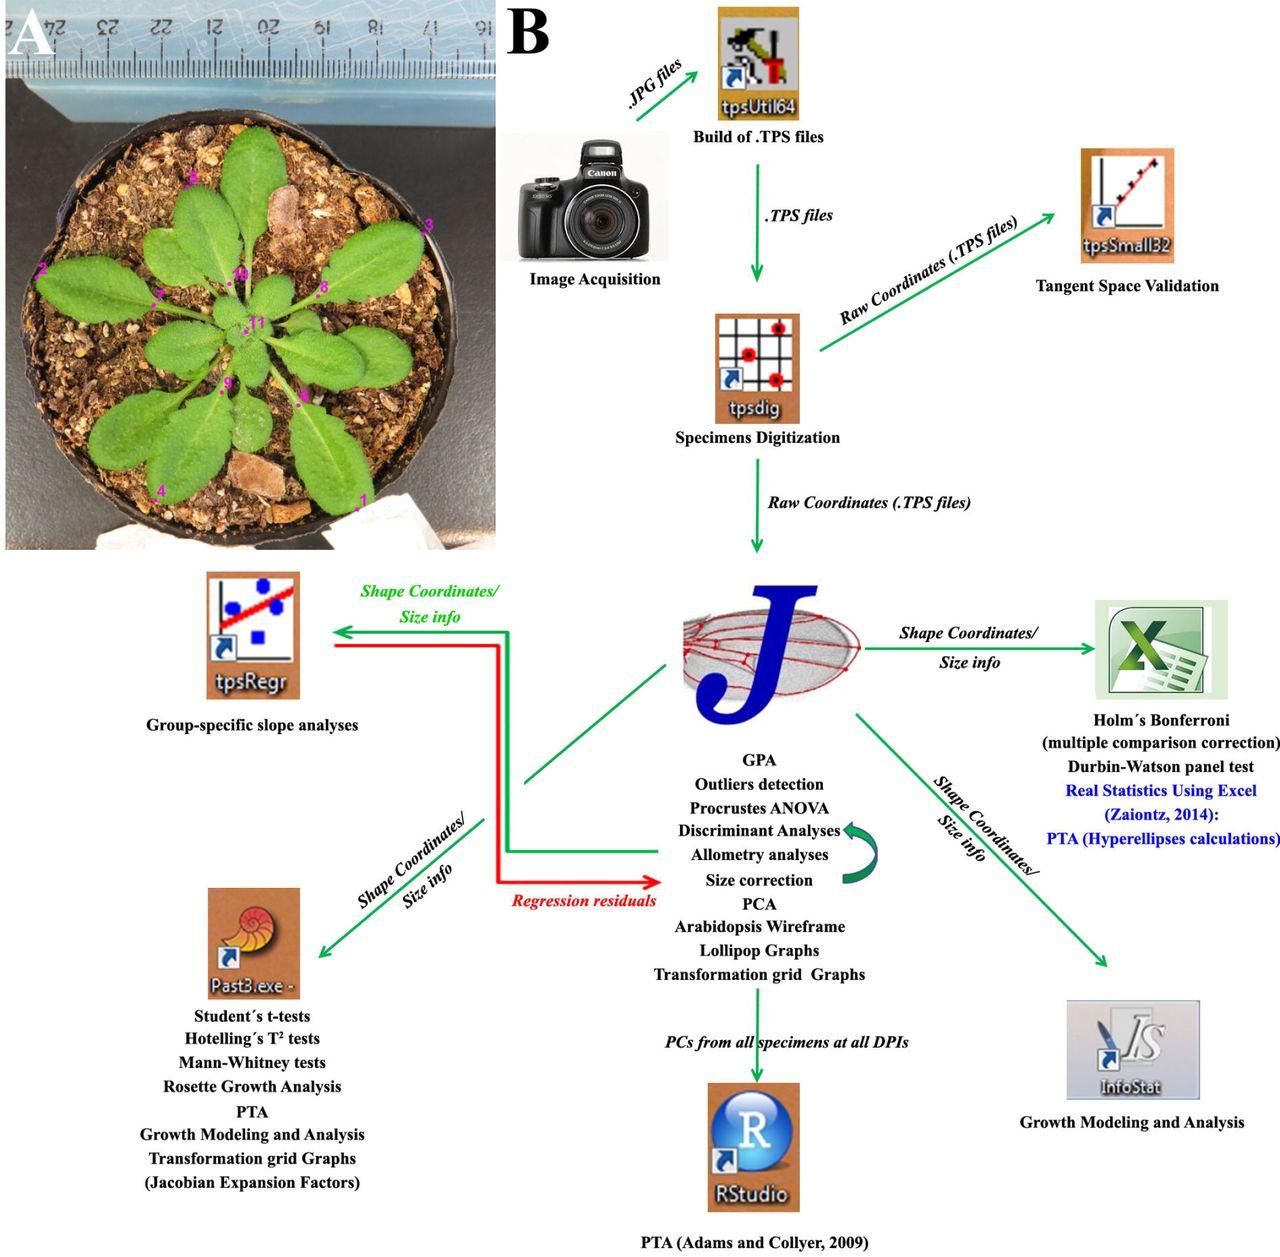 Arabidopsis phenotyping through Geometric Morphometrics